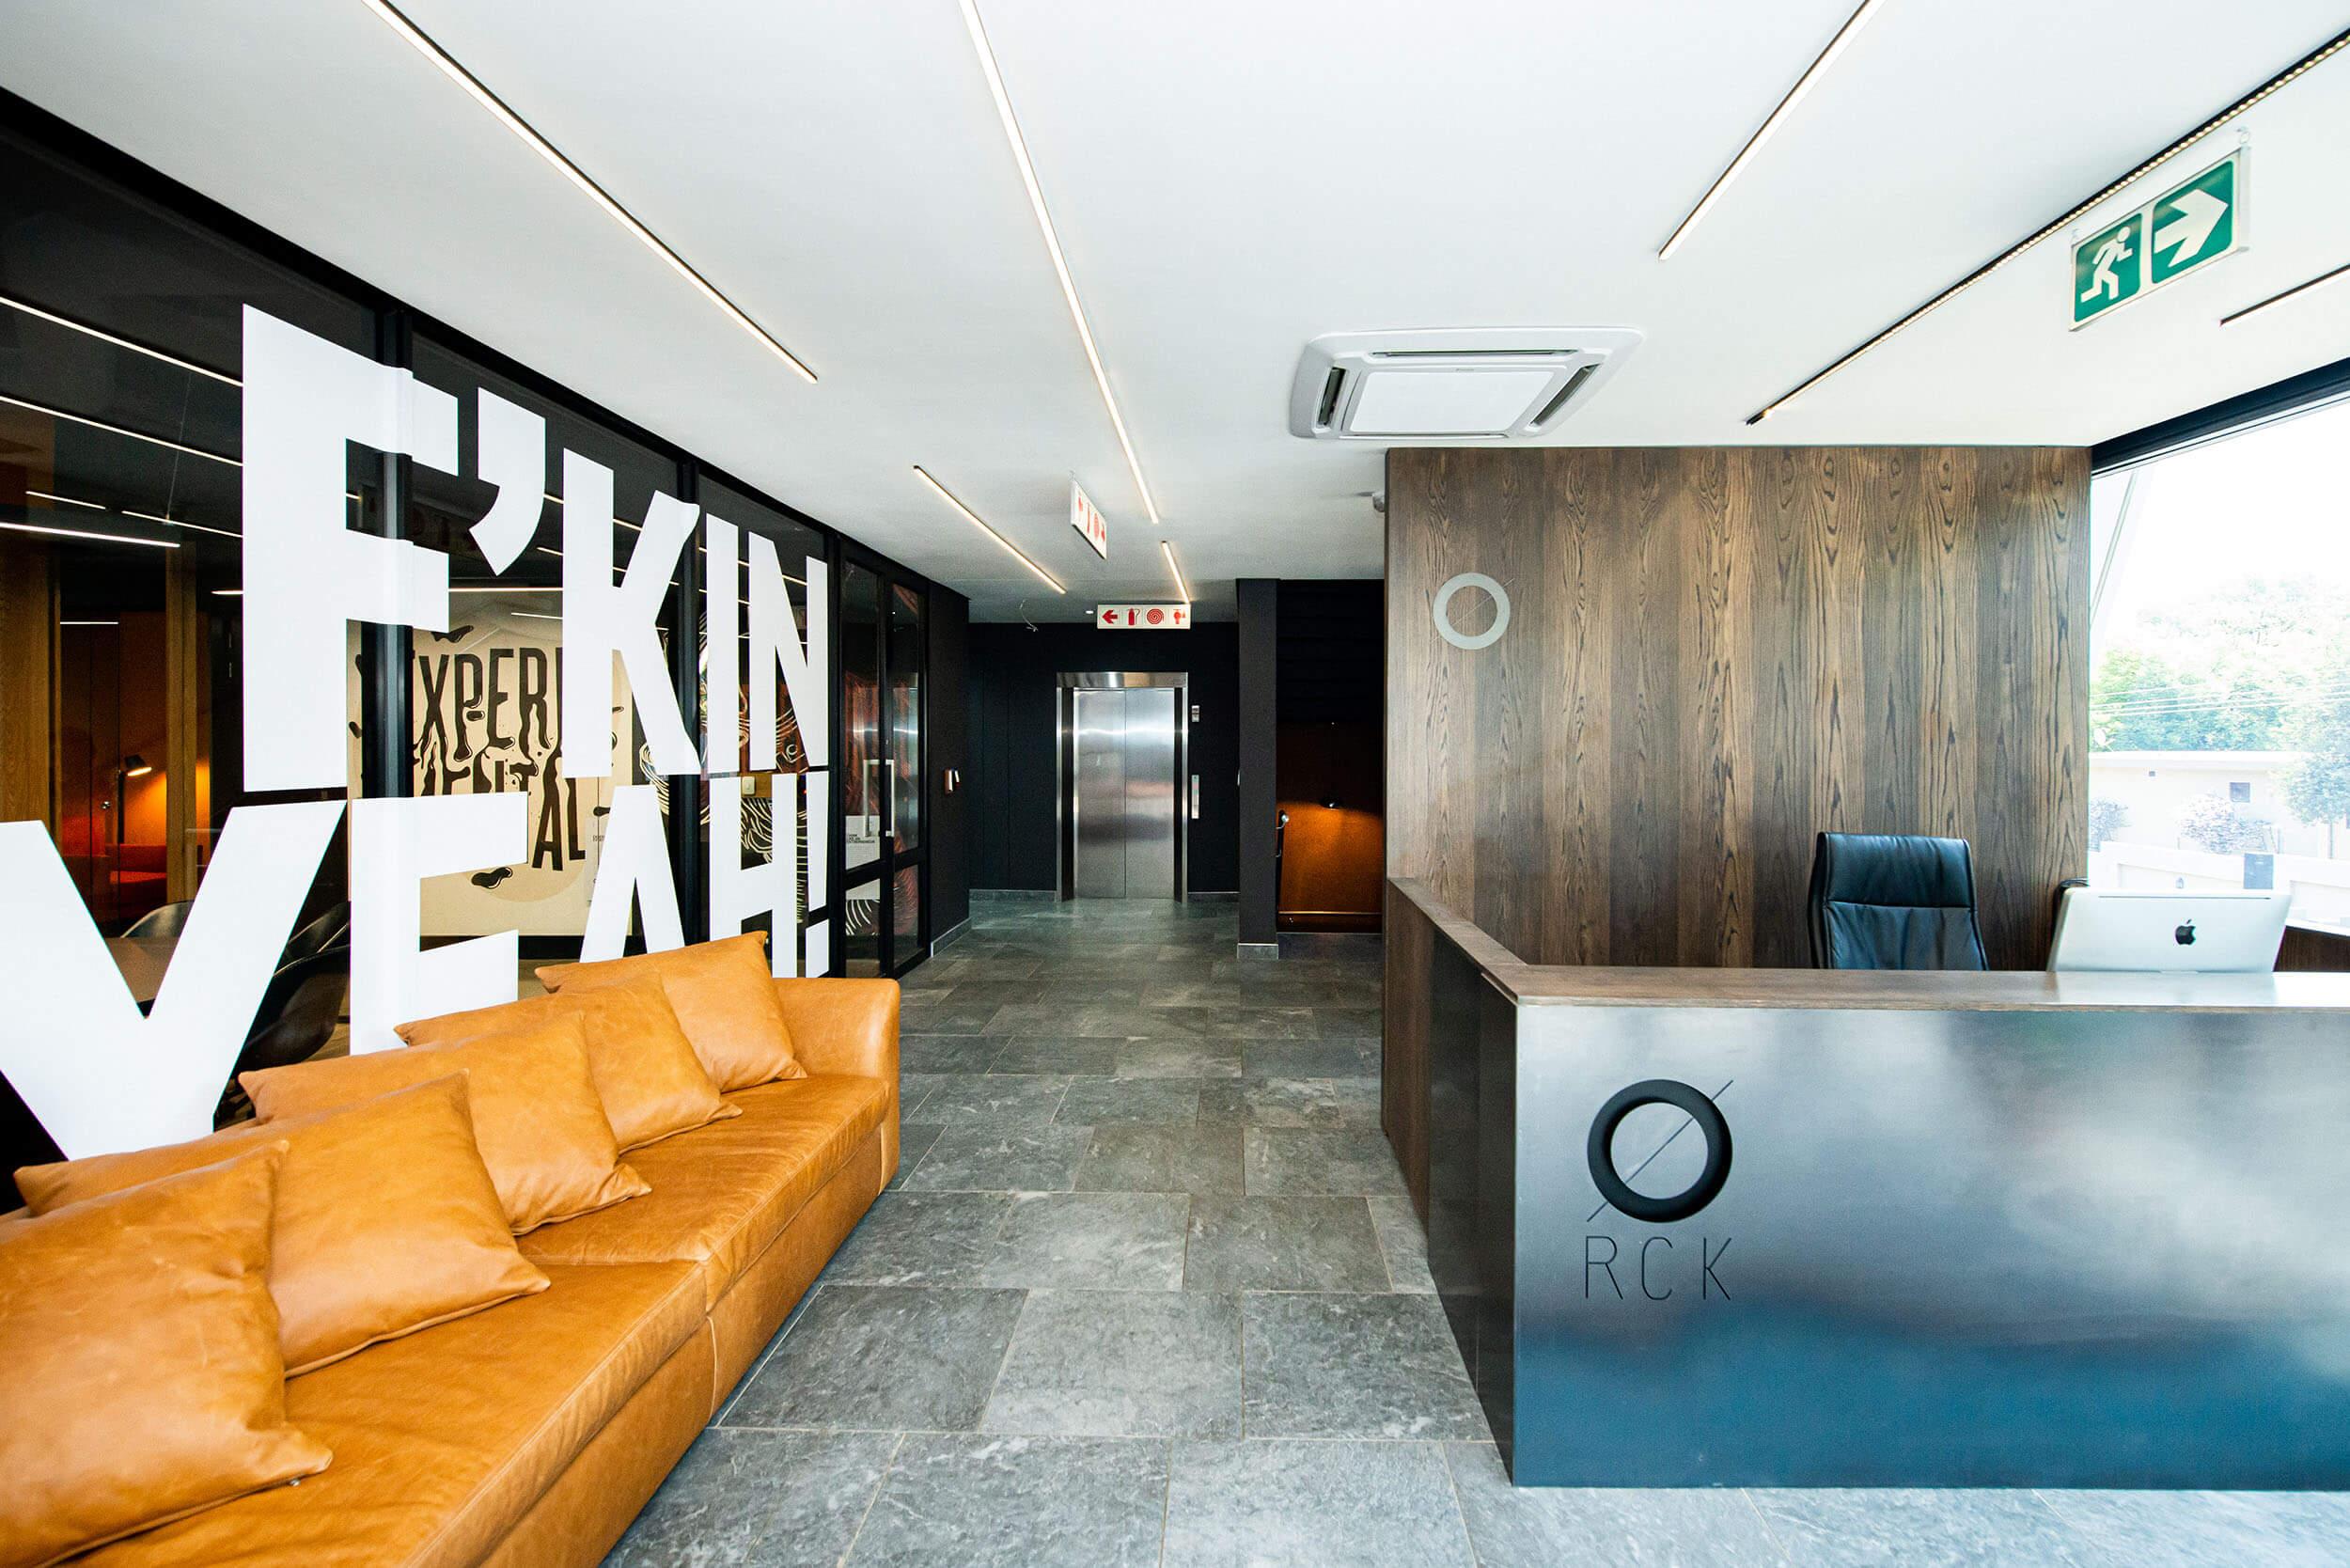 Roering Creative Kin - Turnkey Interiors - Corporate Interior Design and Build